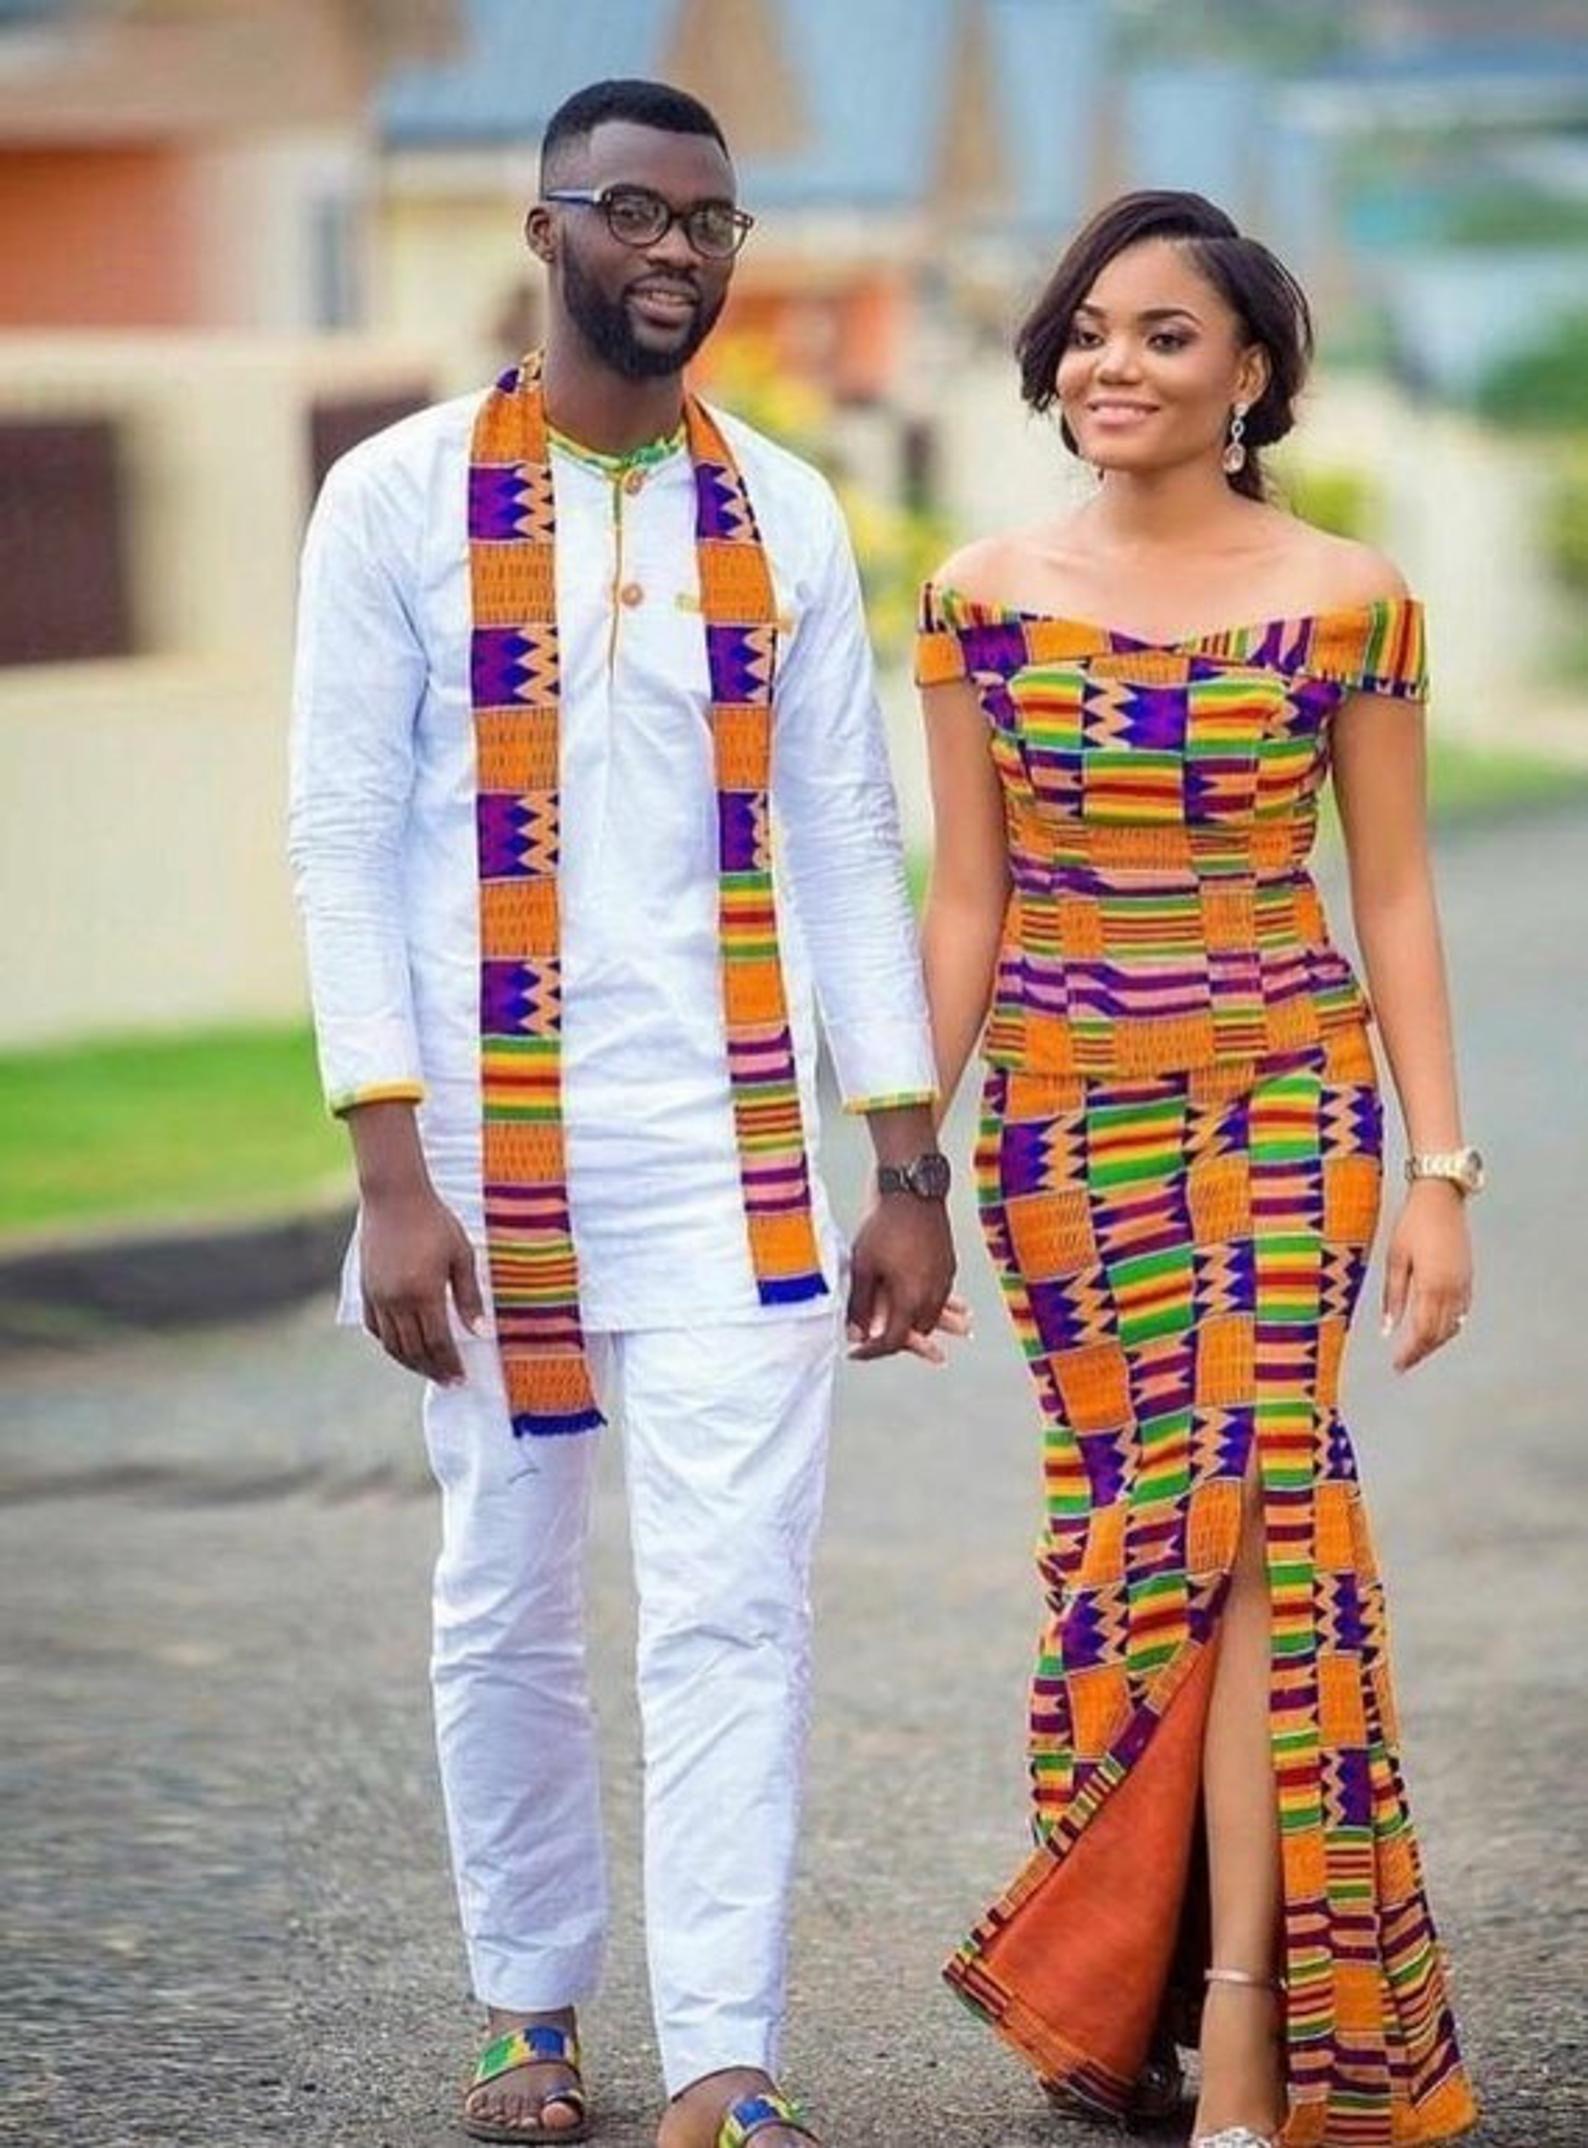 MAXHOSA A/W19 | AMASIKO NEZITHETHE | Fashion, African